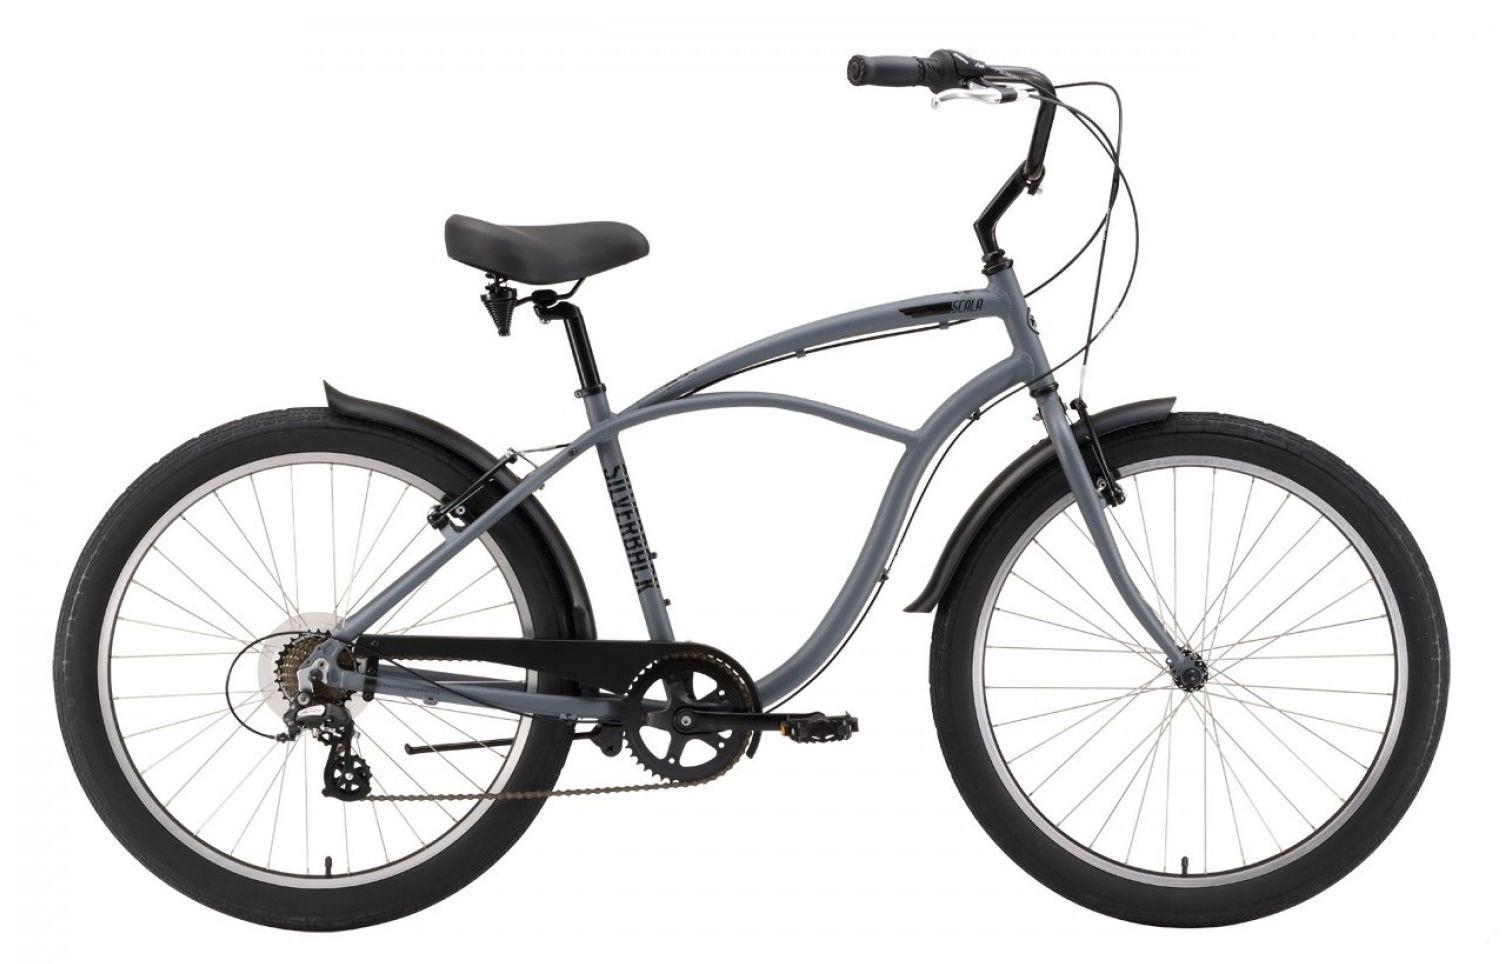 Велосипед Silverback Scala 7 2016 велосипед silverback syncra 1 2016